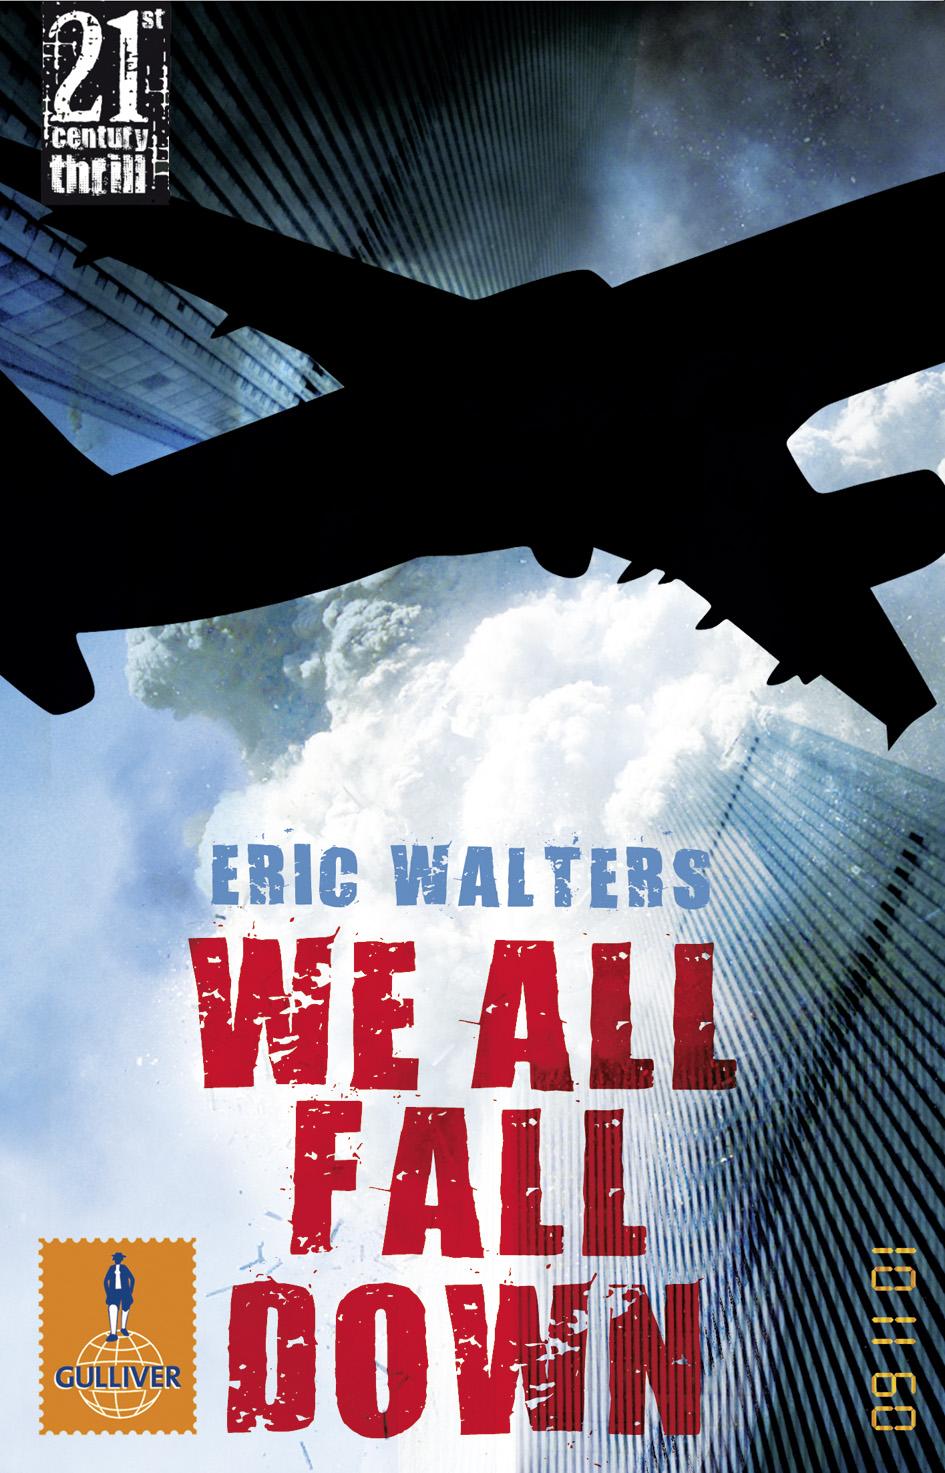 We All Fall Down - Roman - Eric Walters